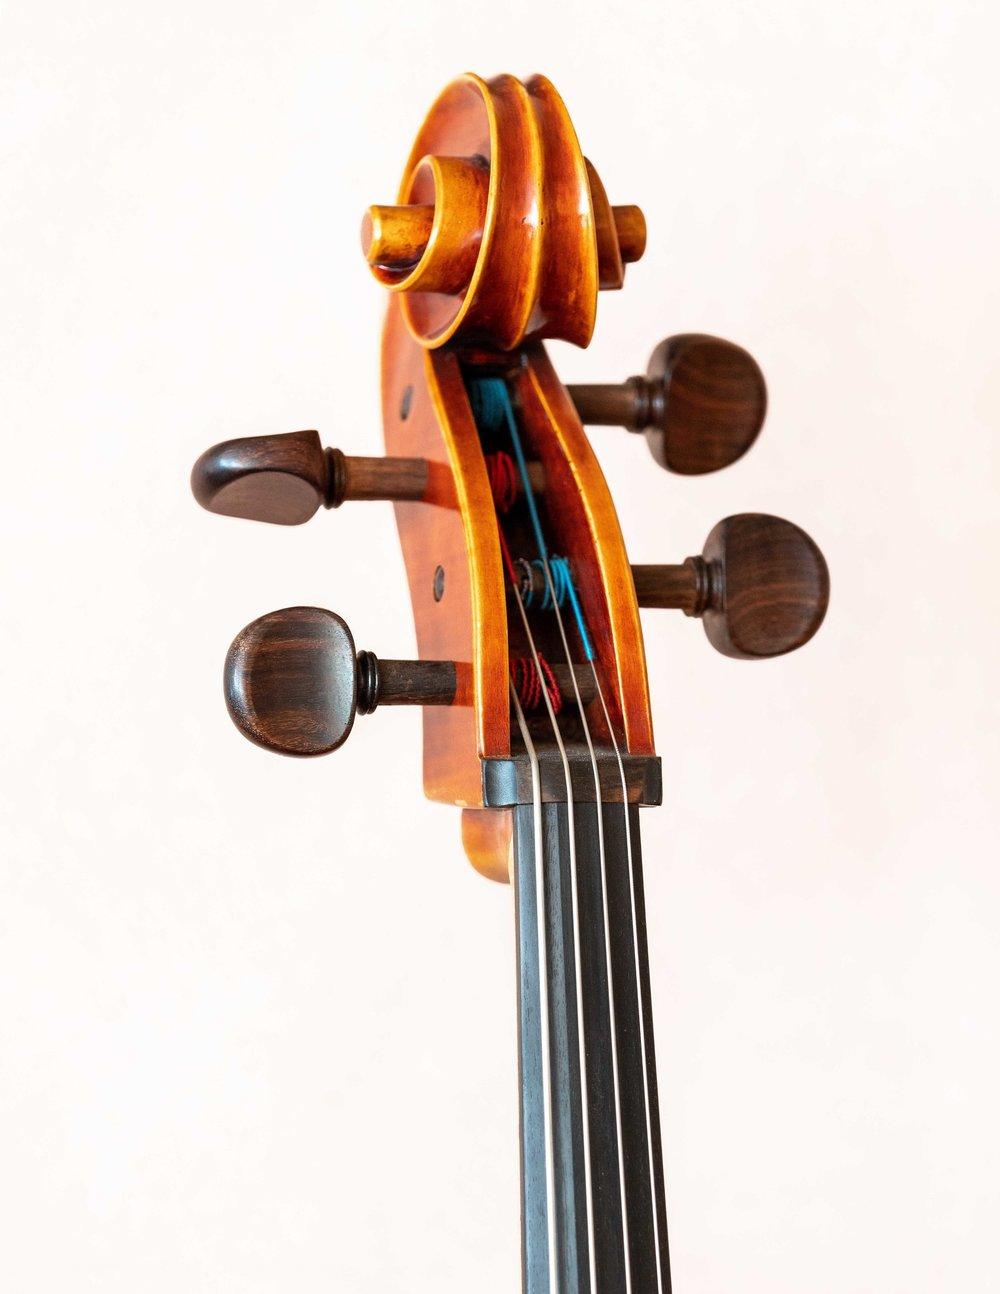 _DS20728_Copyright_sRGB_Relative_Single Finished Violin.jpg